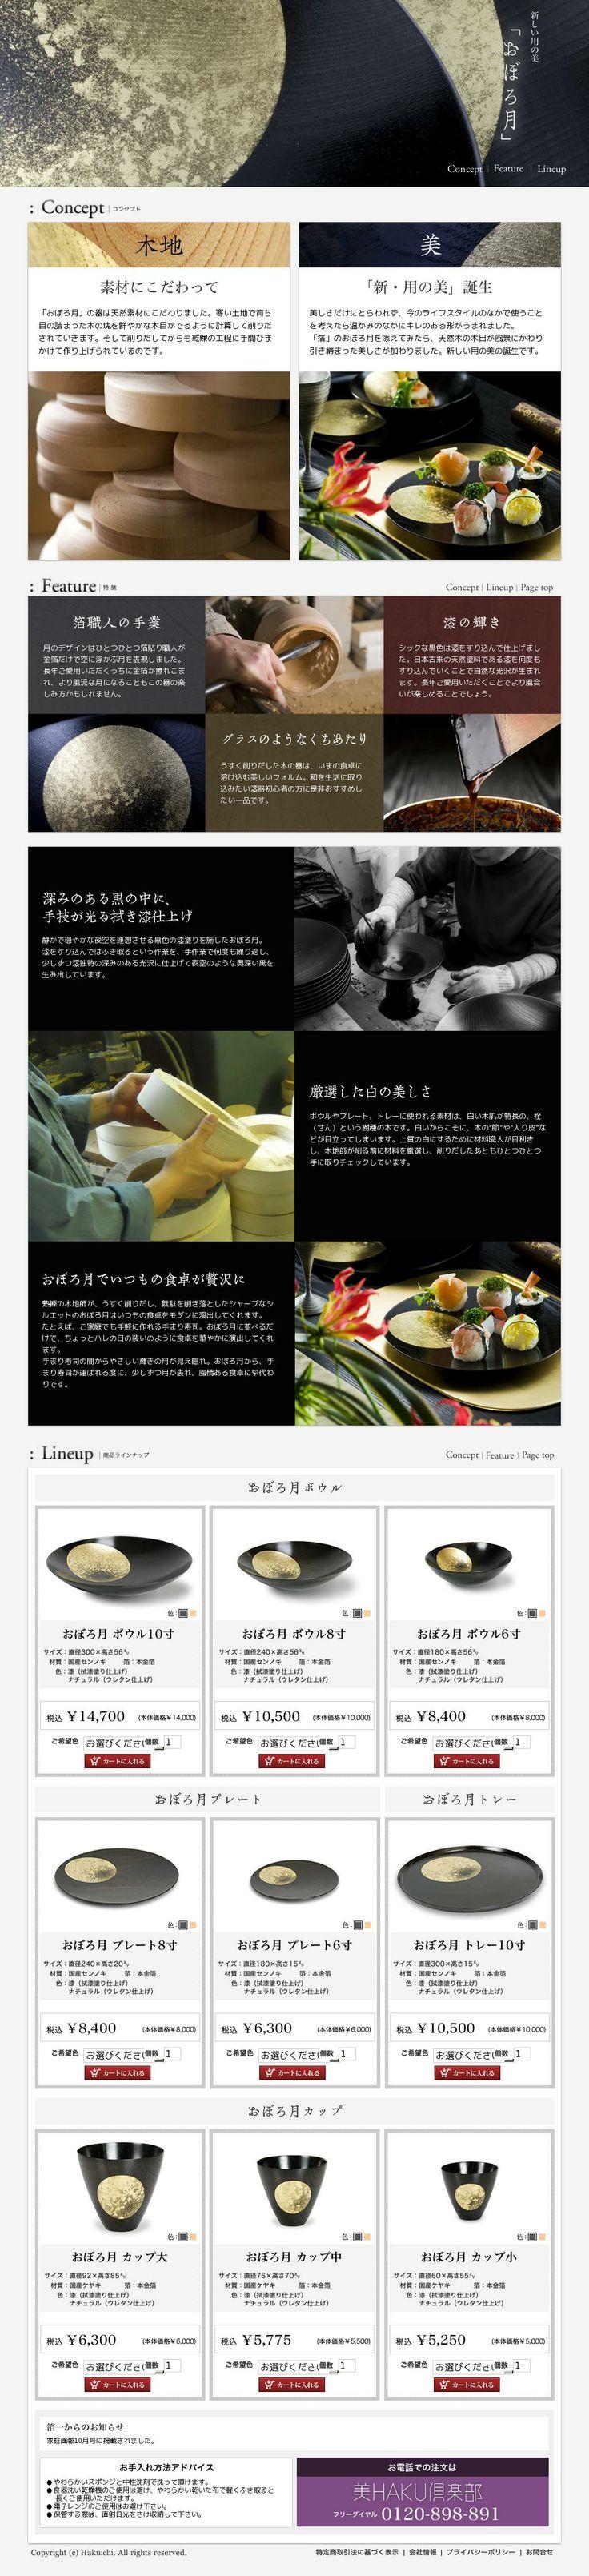 The website 'http://www.hakuichi.co.jp/oboroduki/' courtesy of @Pinstamatic (http://pinstamatic.com)